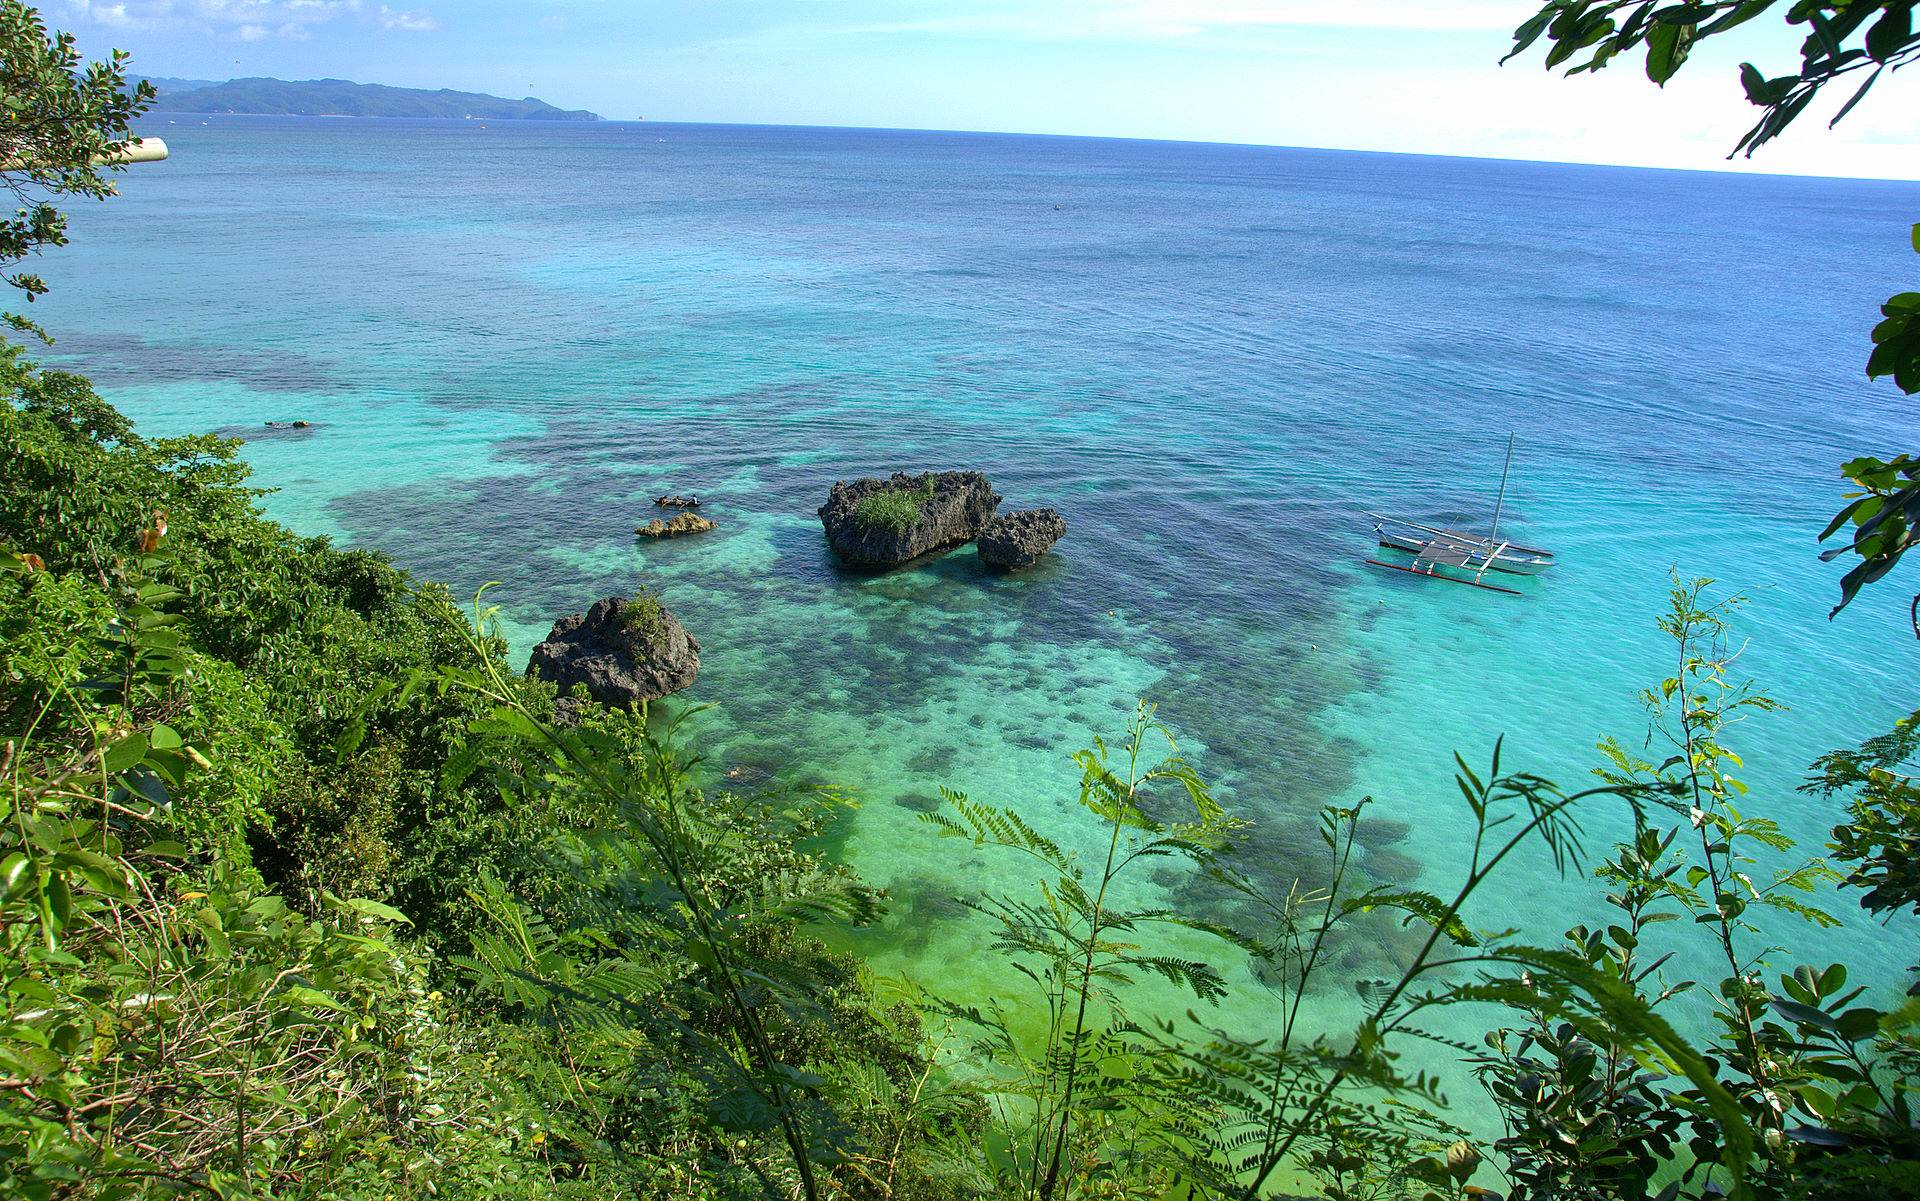 Hd Tropical Island Beach Paradise Wallpapers And Backgrounds: Tropical Island Desktop Backgrounds